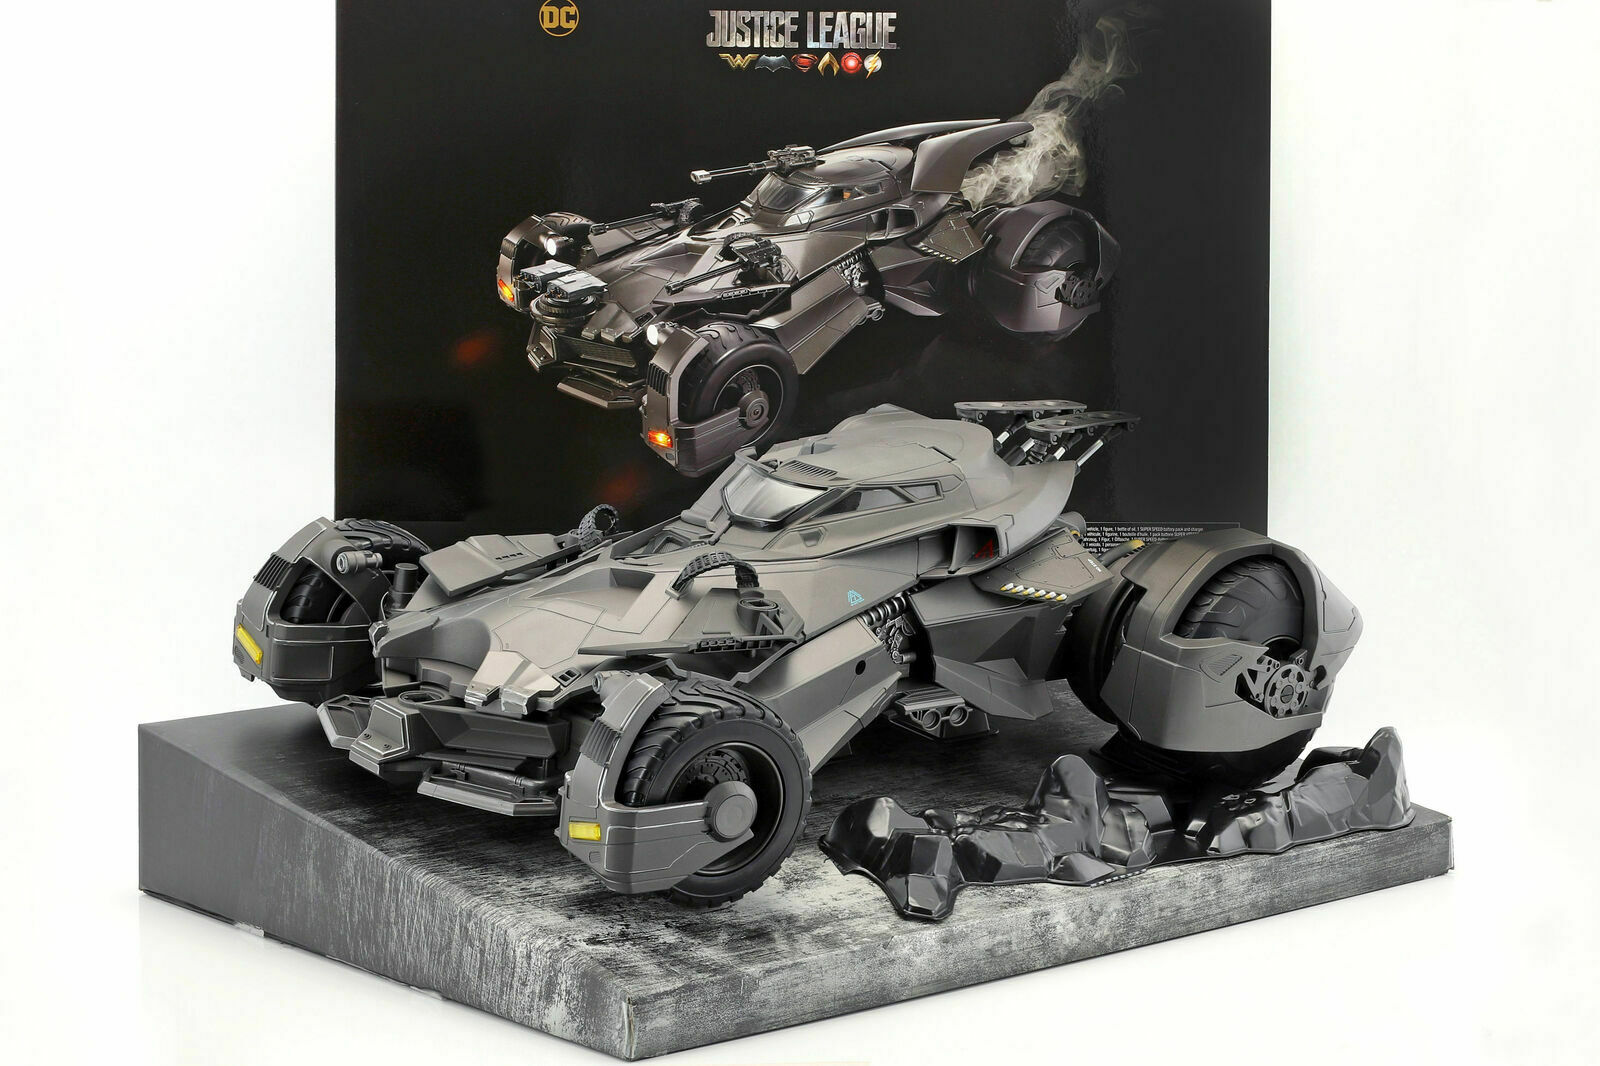 Mattel Frl54 DC Justice League RC Ferngesteuert Batmobil mit Batman Figur Wlan